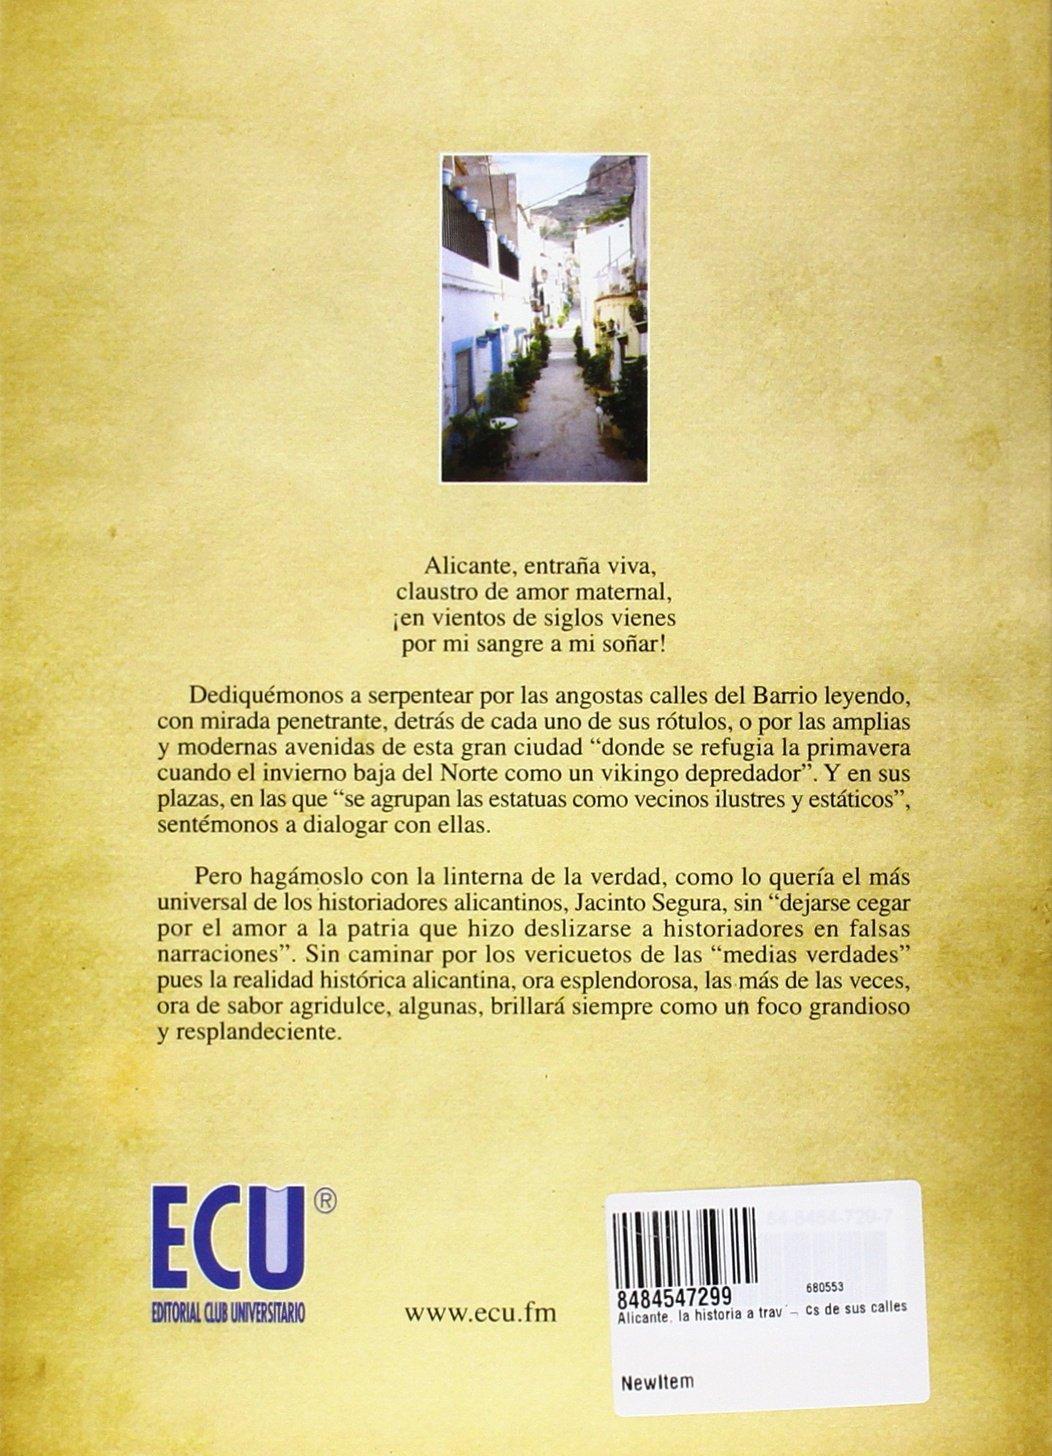 Alicante, la historia a través de sus calles: Manuel Martínez López: 9788484547297: Amazon.com: Books